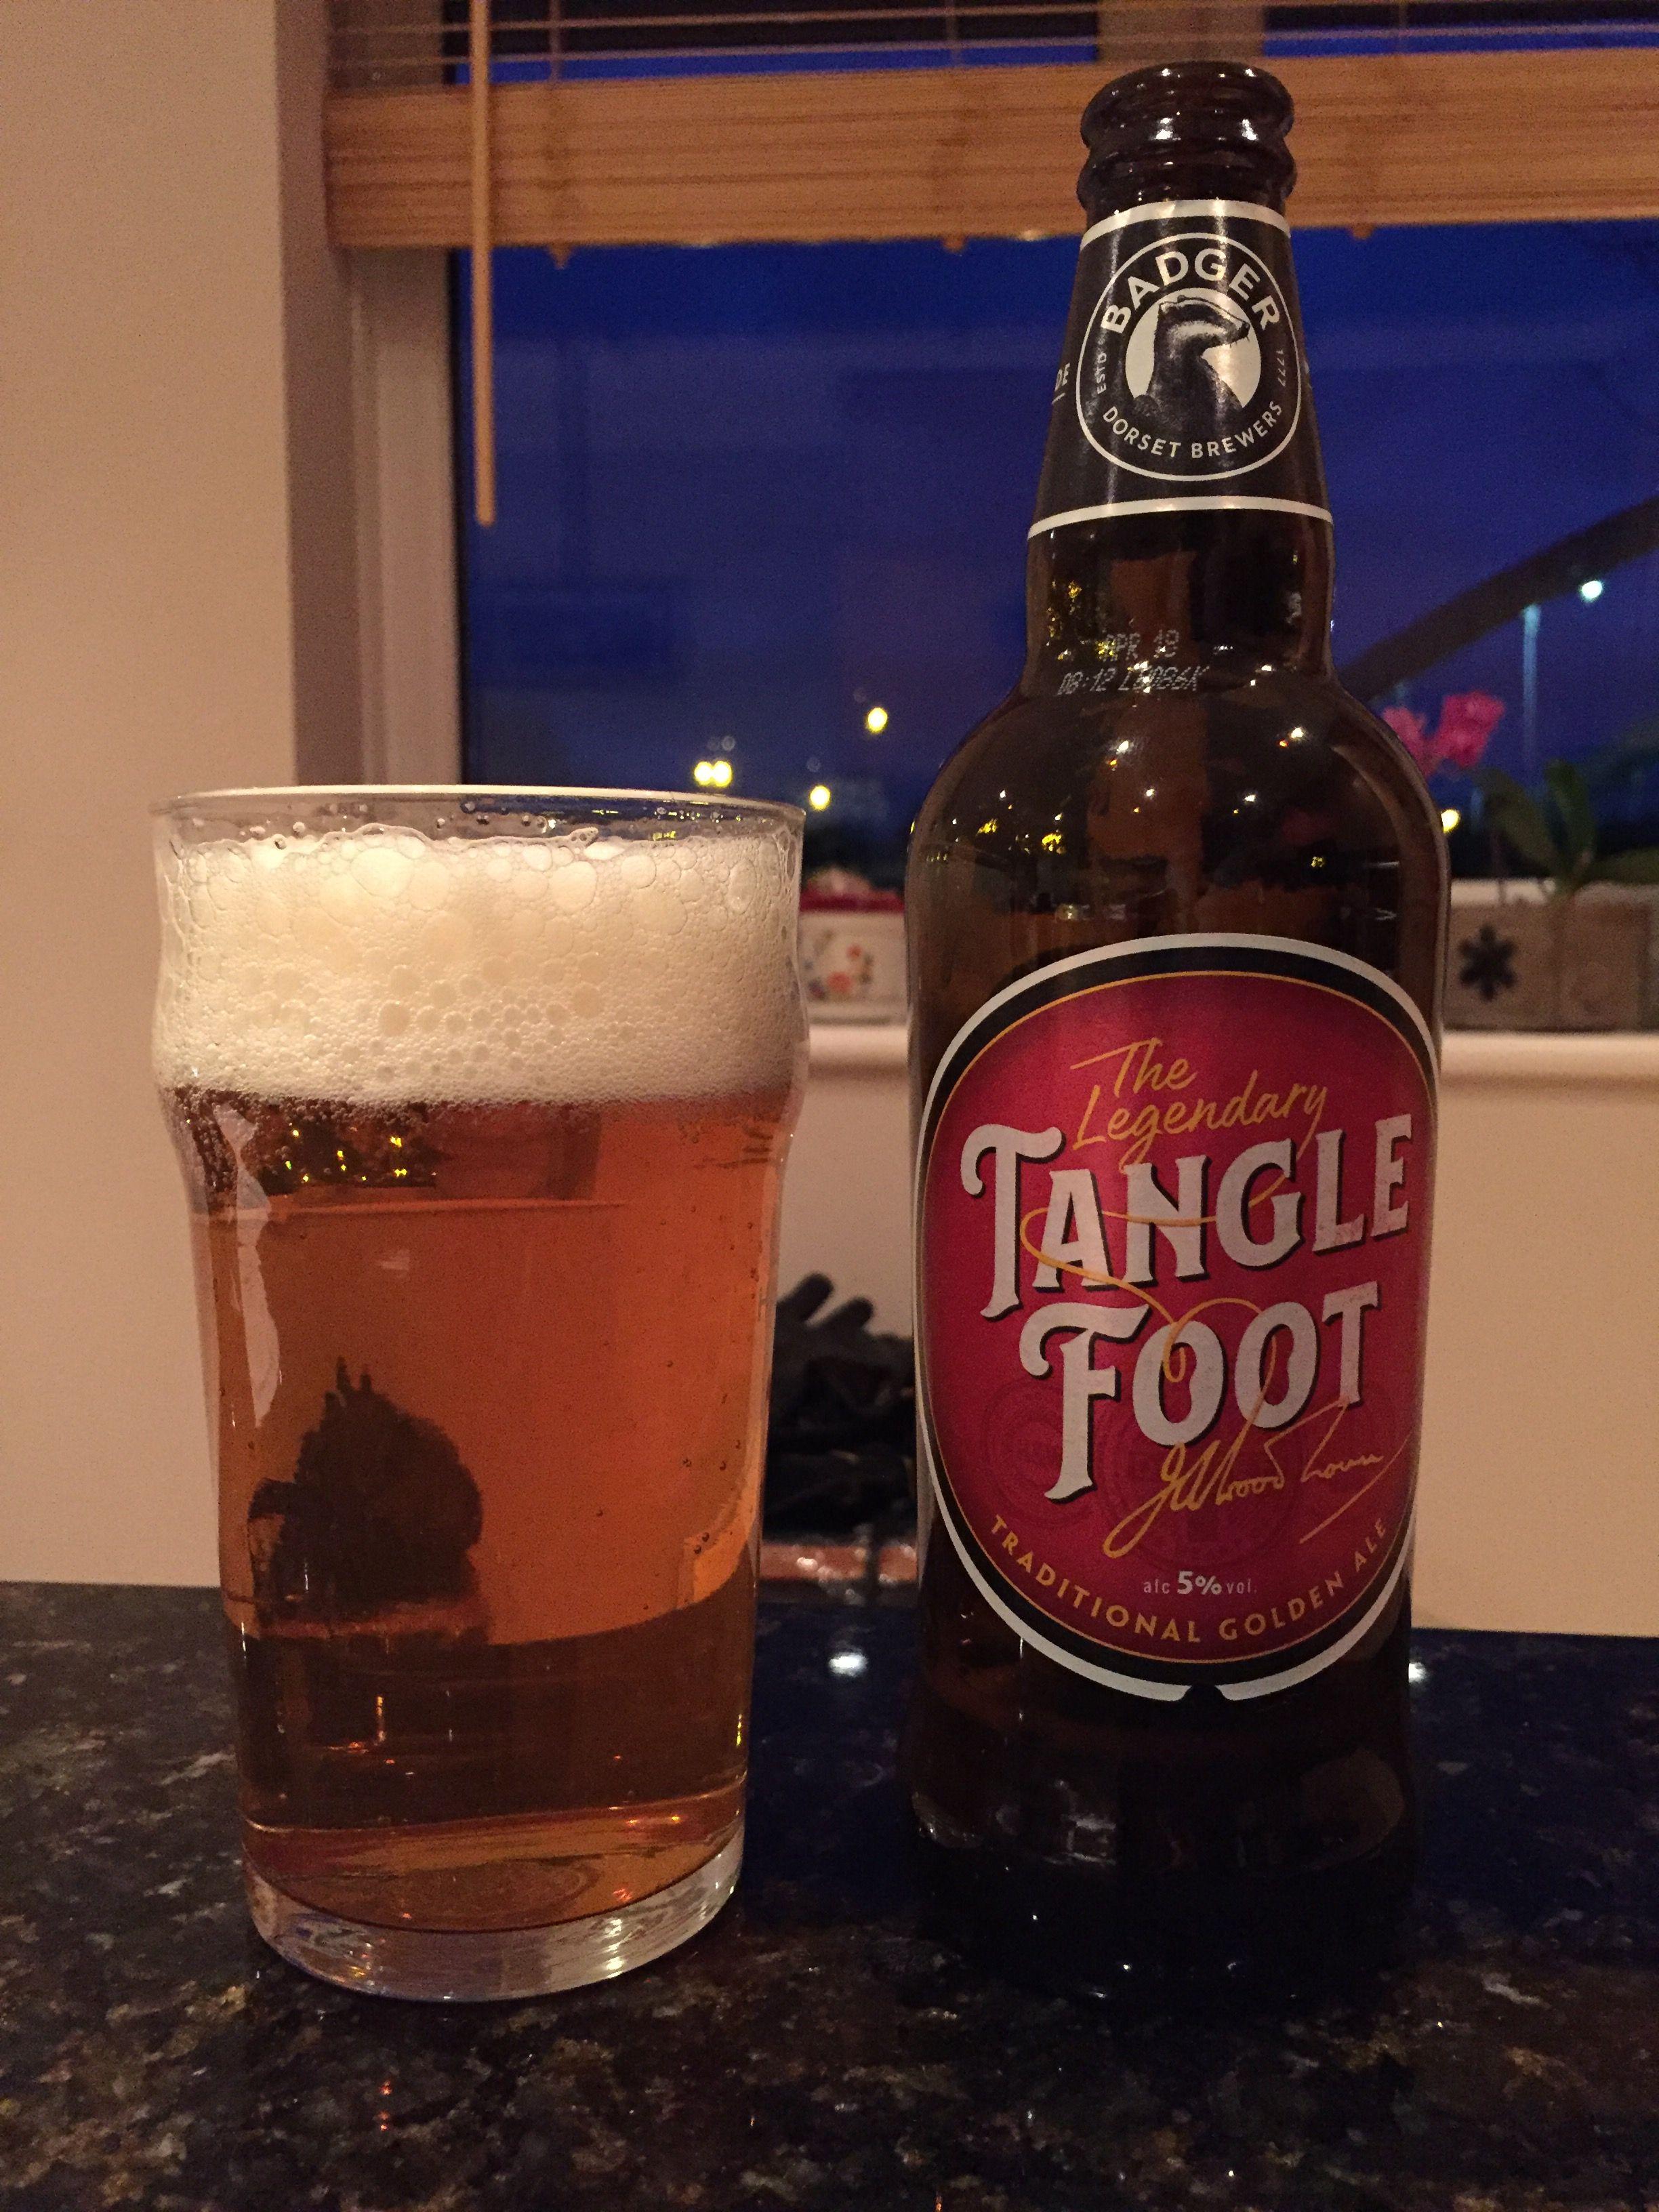 Tangle Foot Traditional Golden Ale Badger Brewery 2018 12 26 Vintage Beer Beer Ale